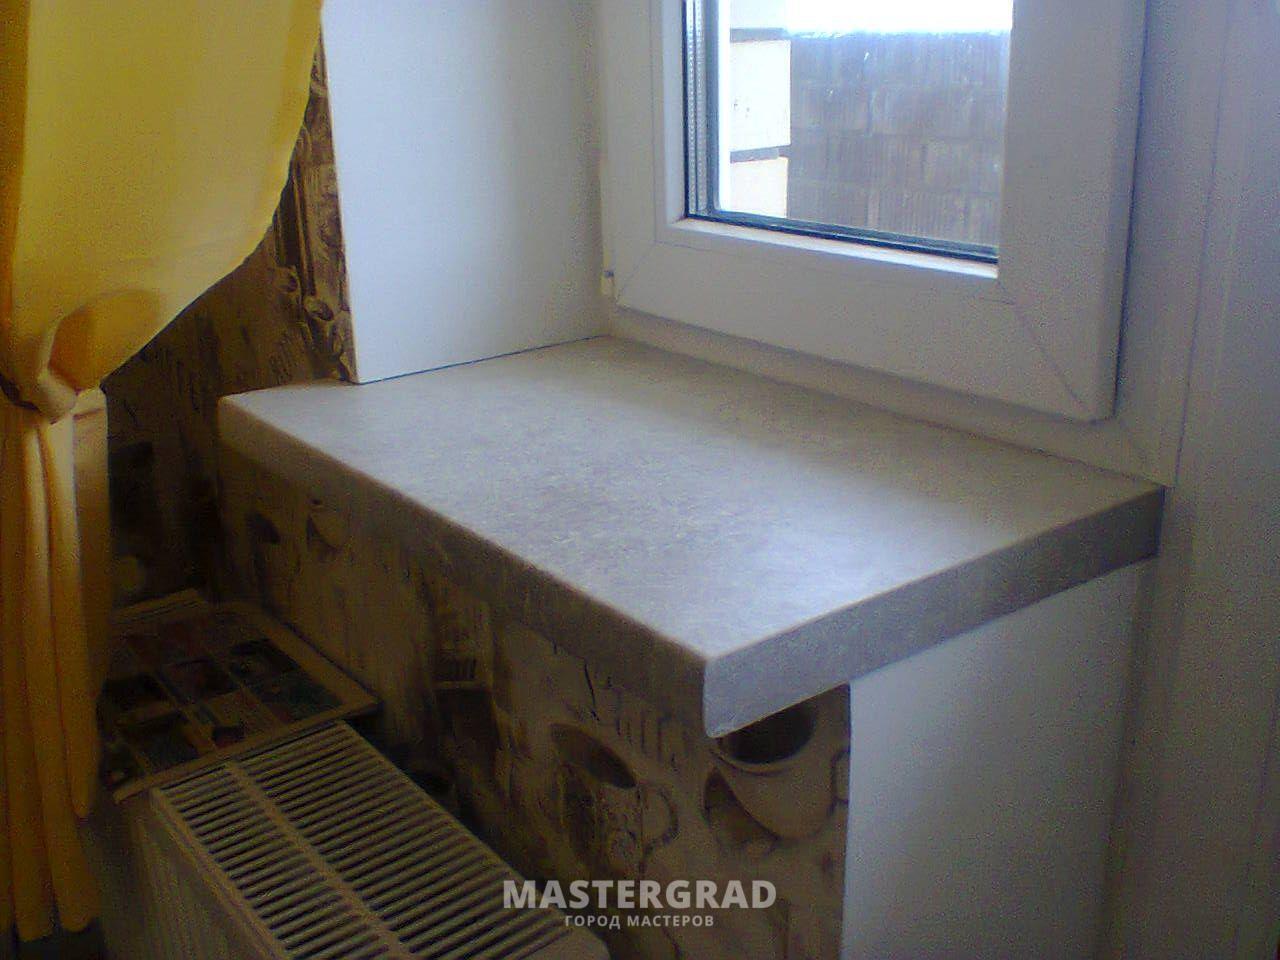 Подоконник-столешница вместо балконного блока столешница из мрамора уход